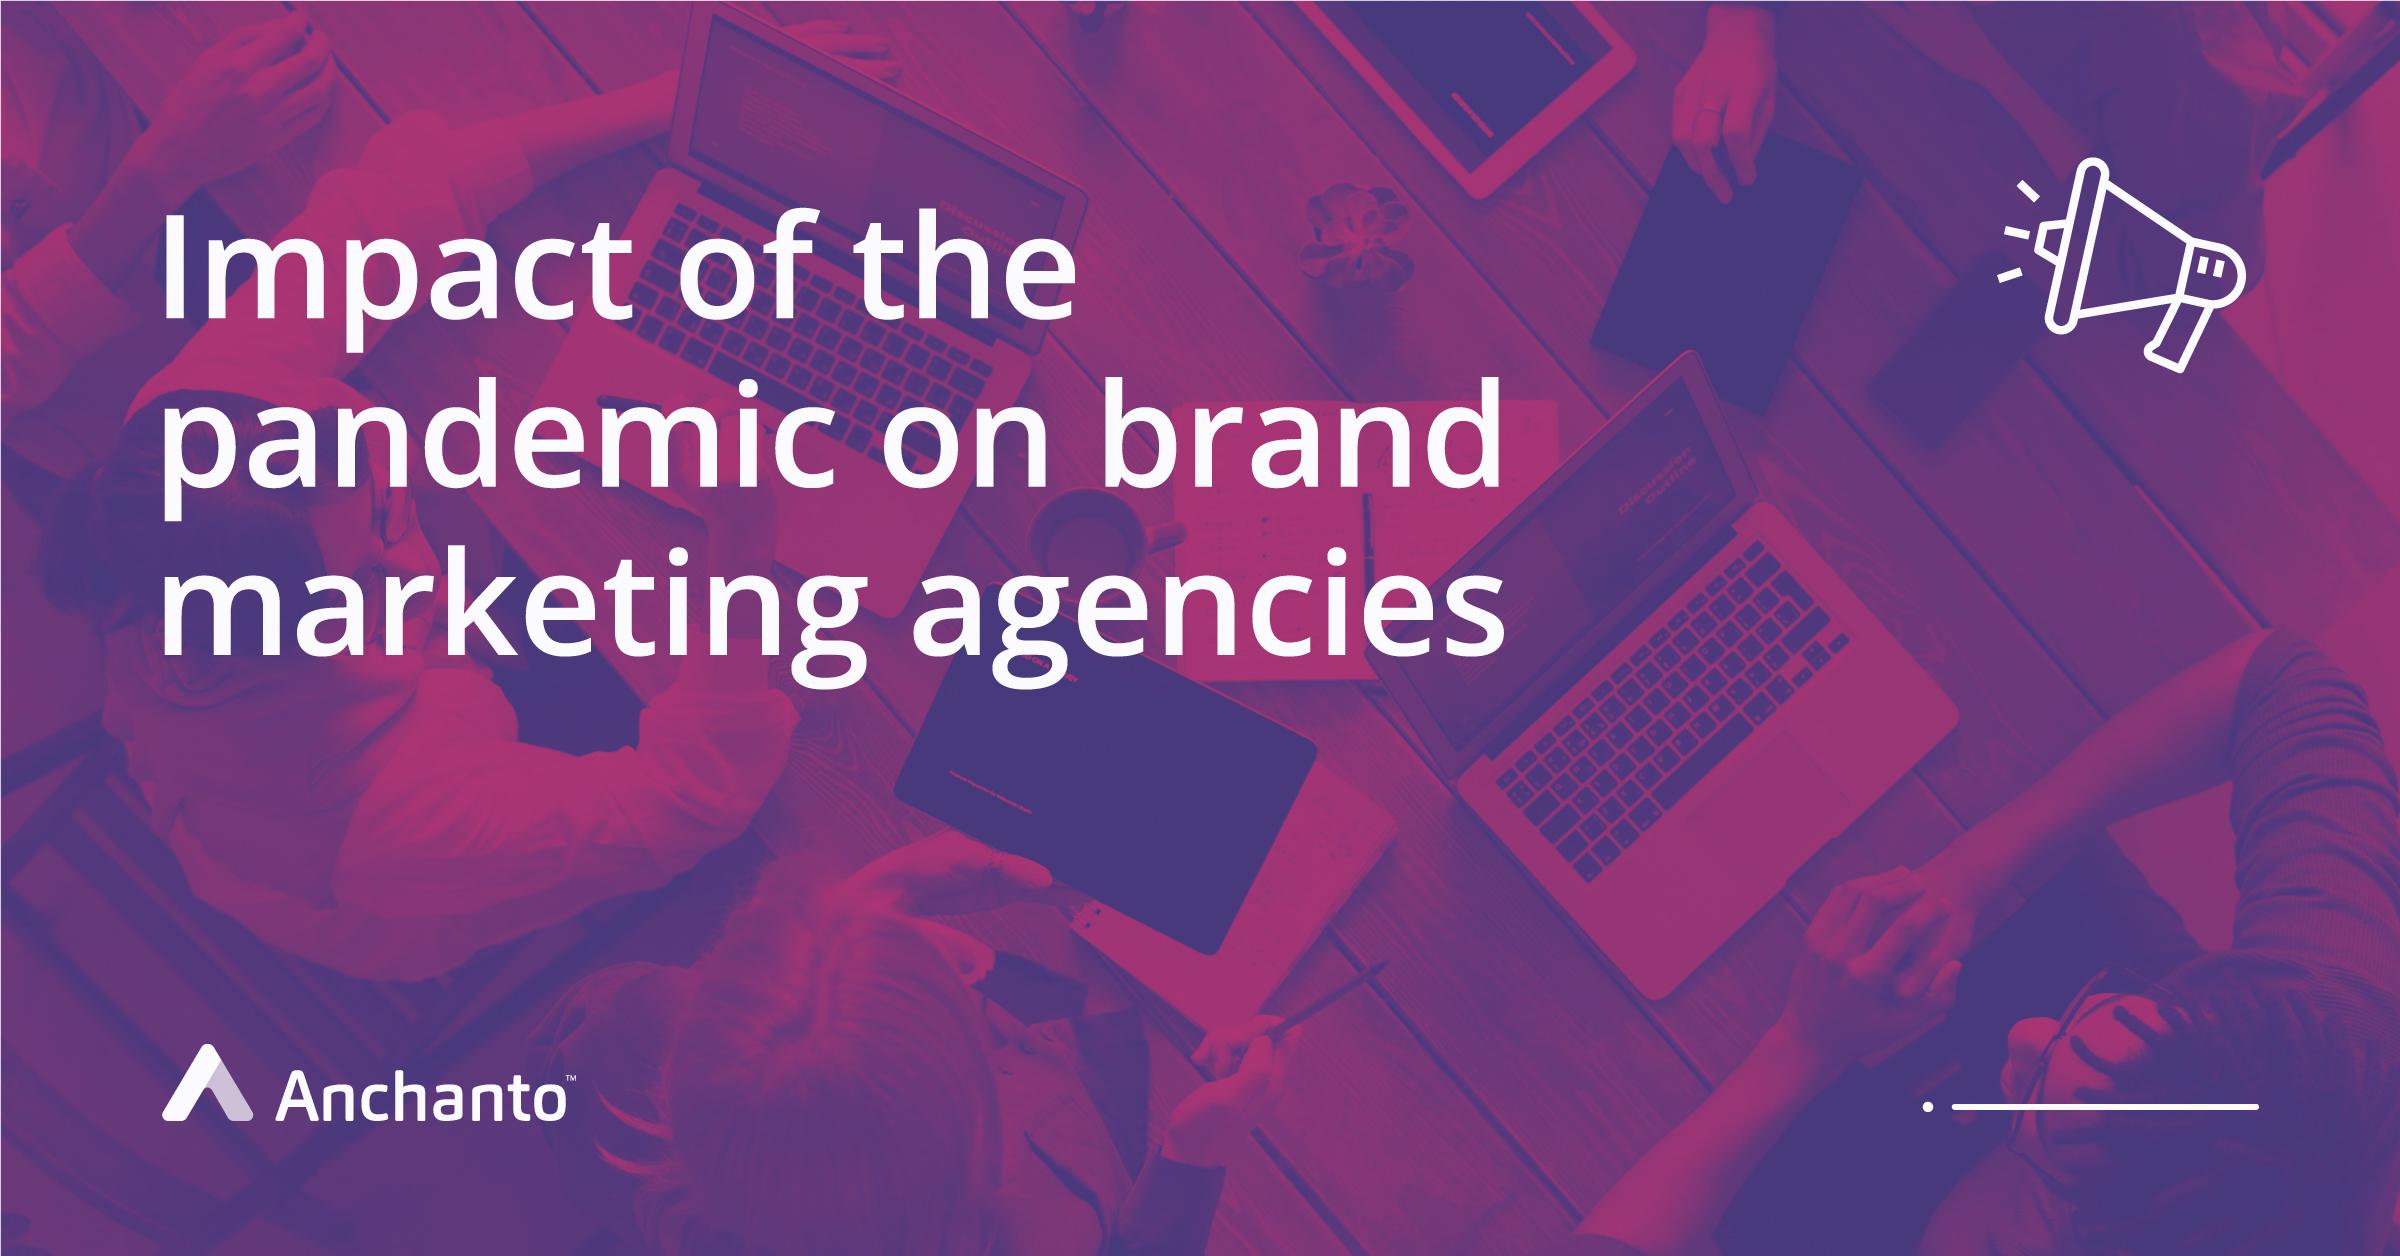 Impact of Pandemic on Brand marketing agencies